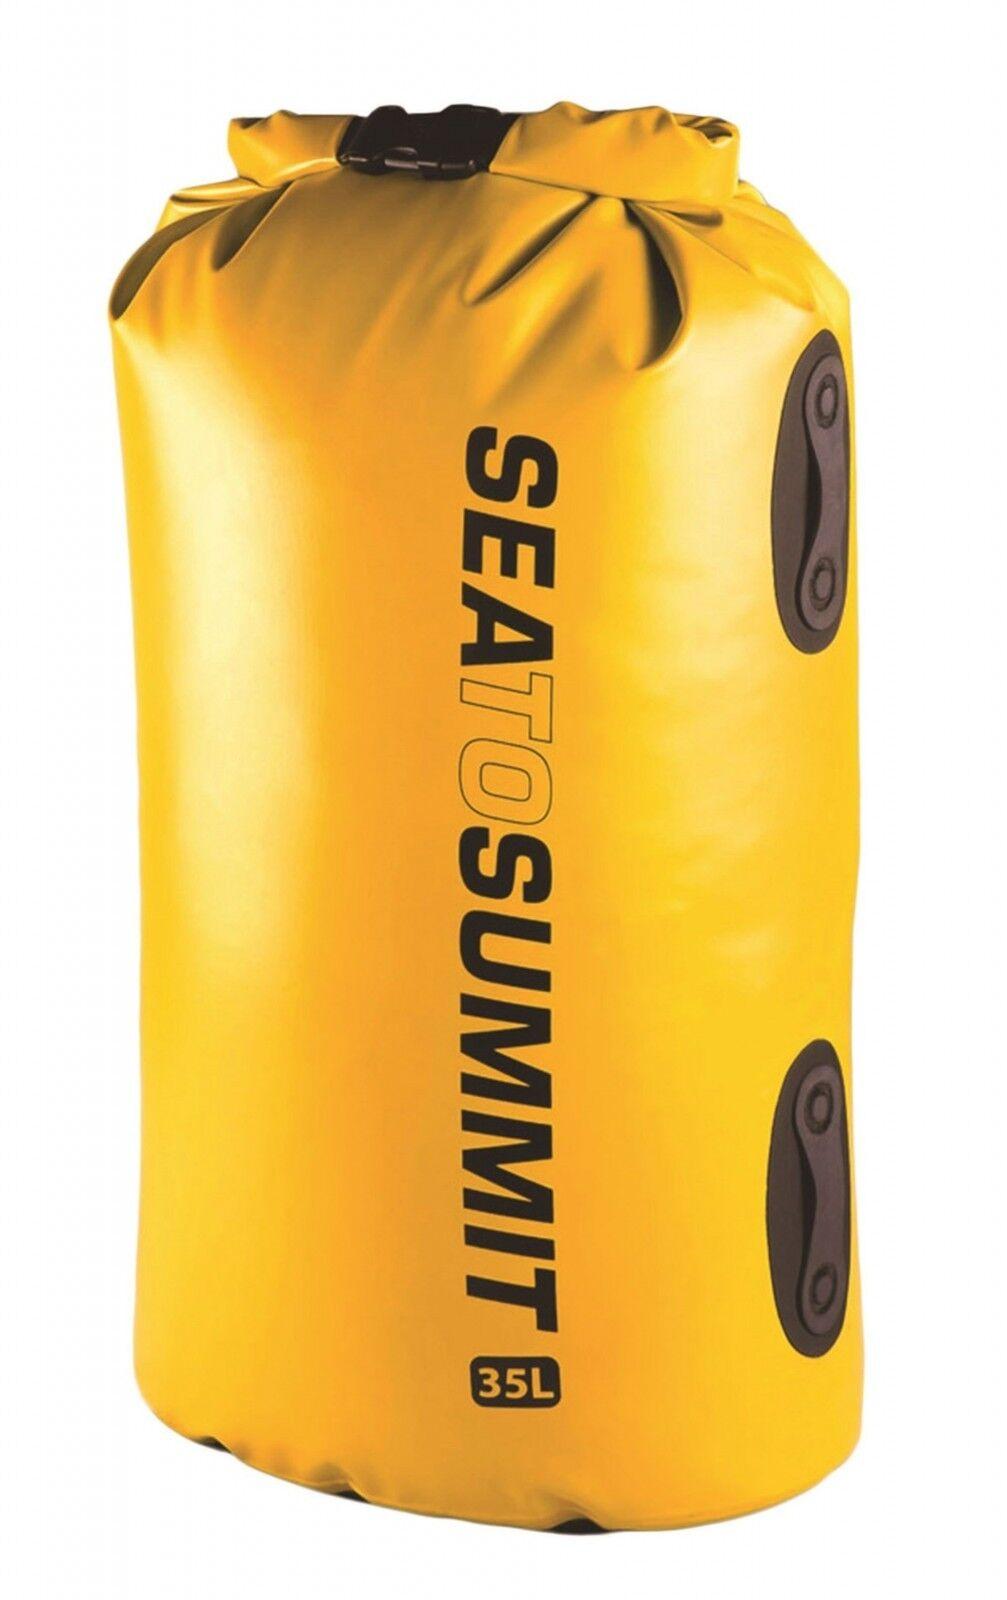 Sea To Summit Borsa Da Viaggio Hydraulic Dry sac 35 L jaune